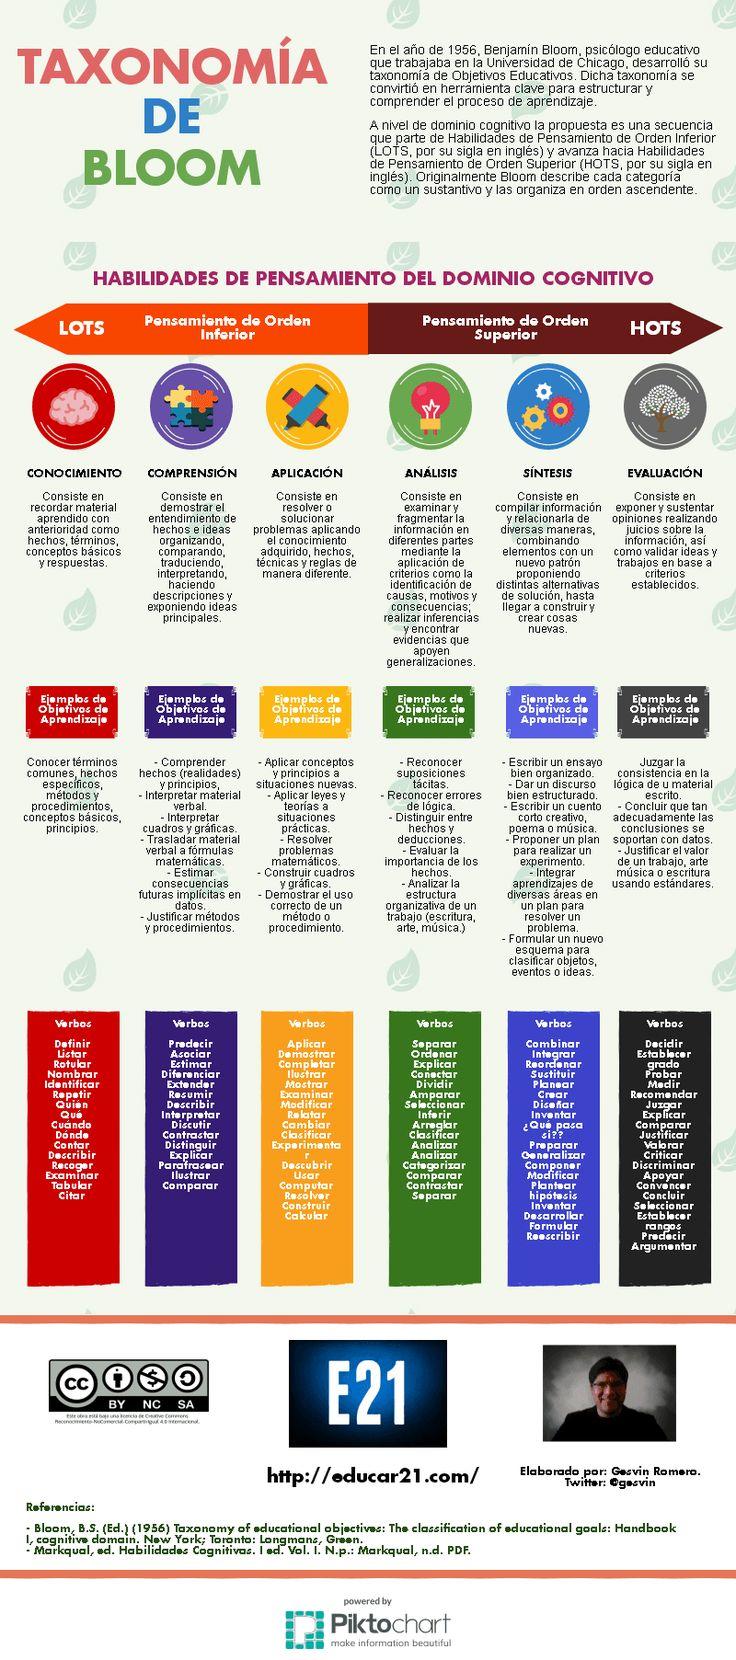 TaxonomíaBloomHabilidadesObjetivosVerbos-Infografía-Educar21.png 800×1,805 pixeles